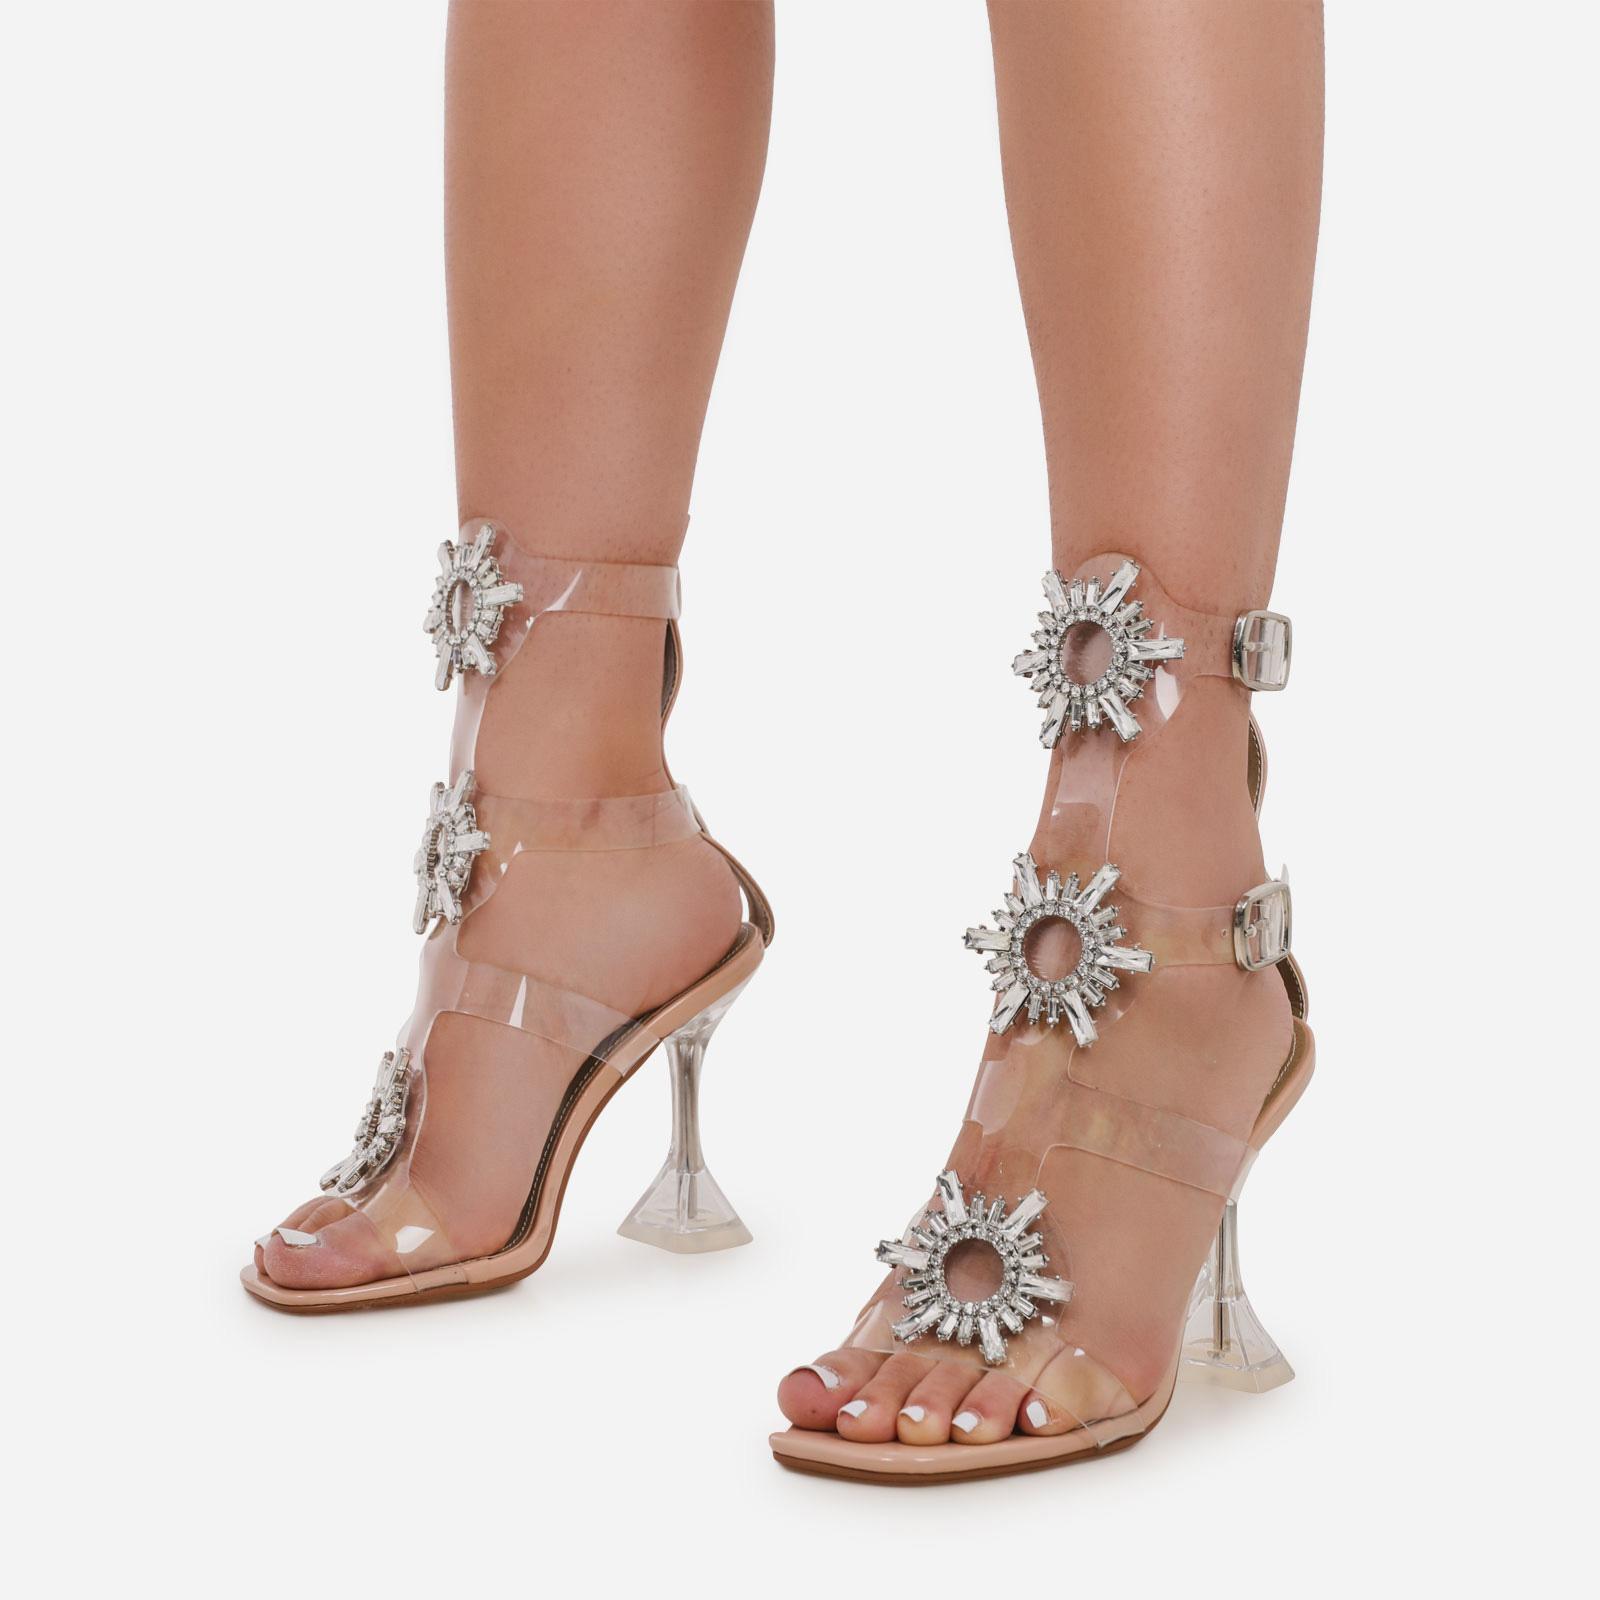 New In: Heels, Boots & Trainers | Women's Footwear | EGO